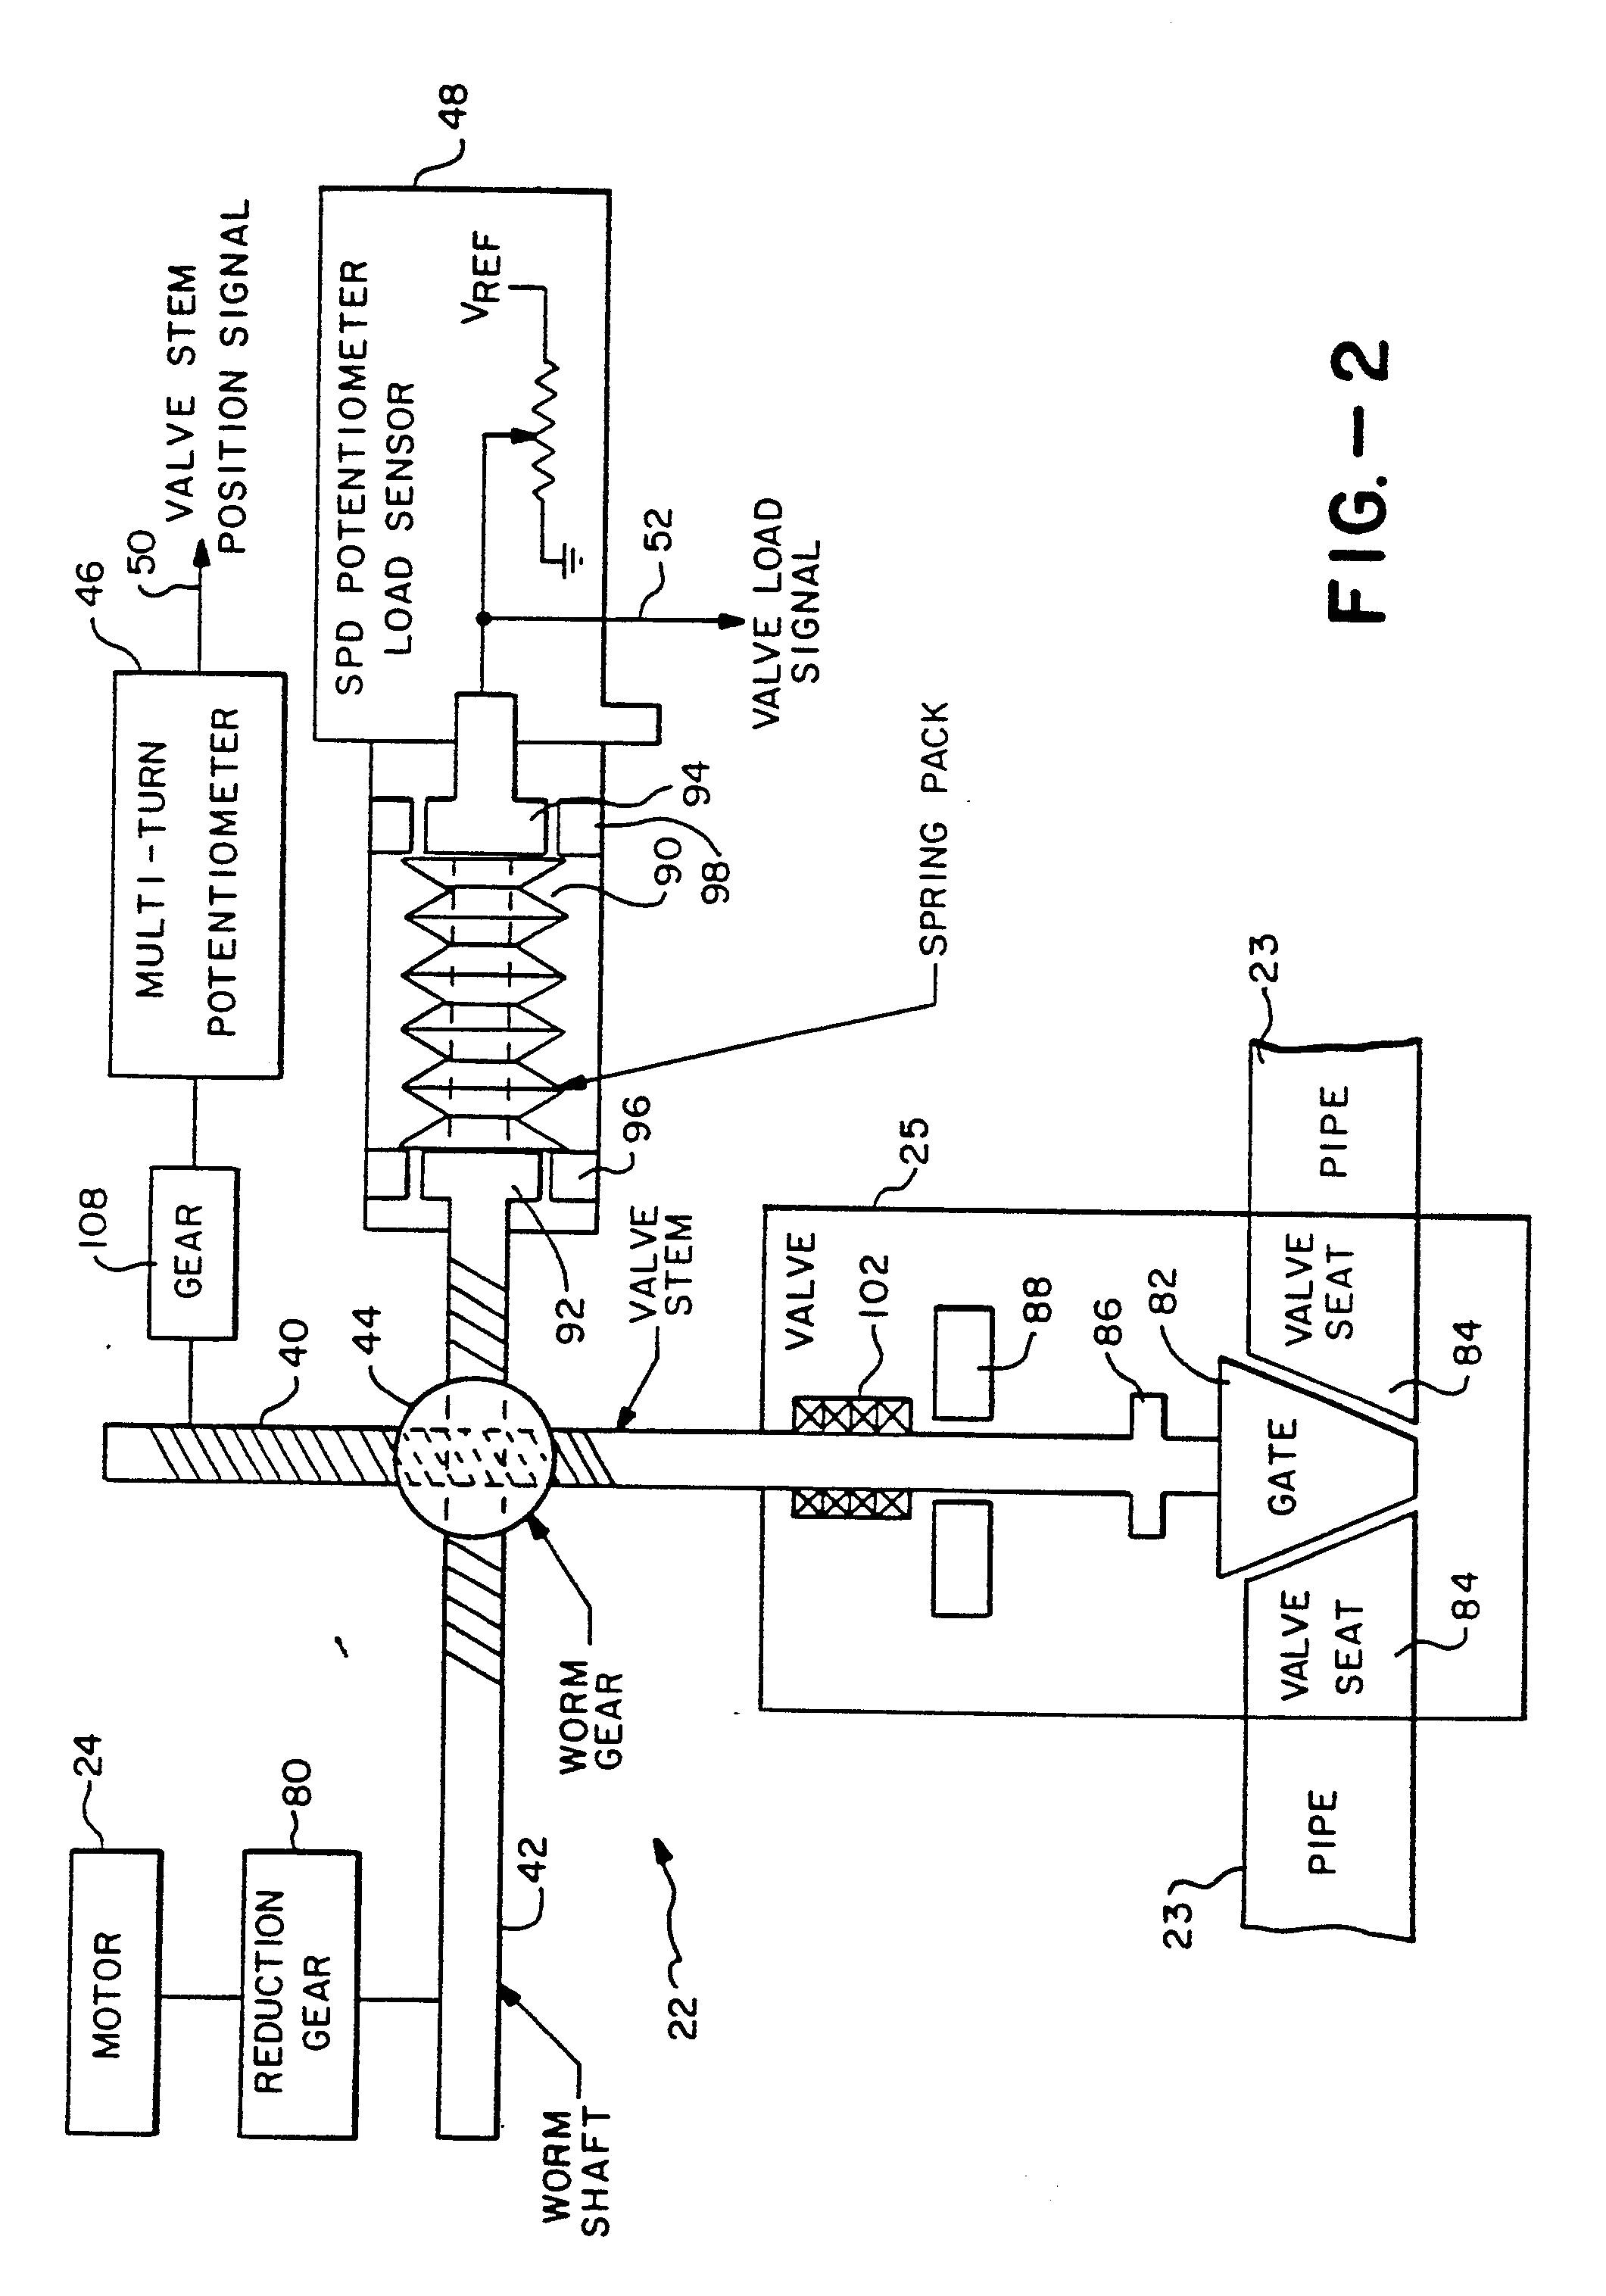 Rotork Iq70 Wiring Diagram